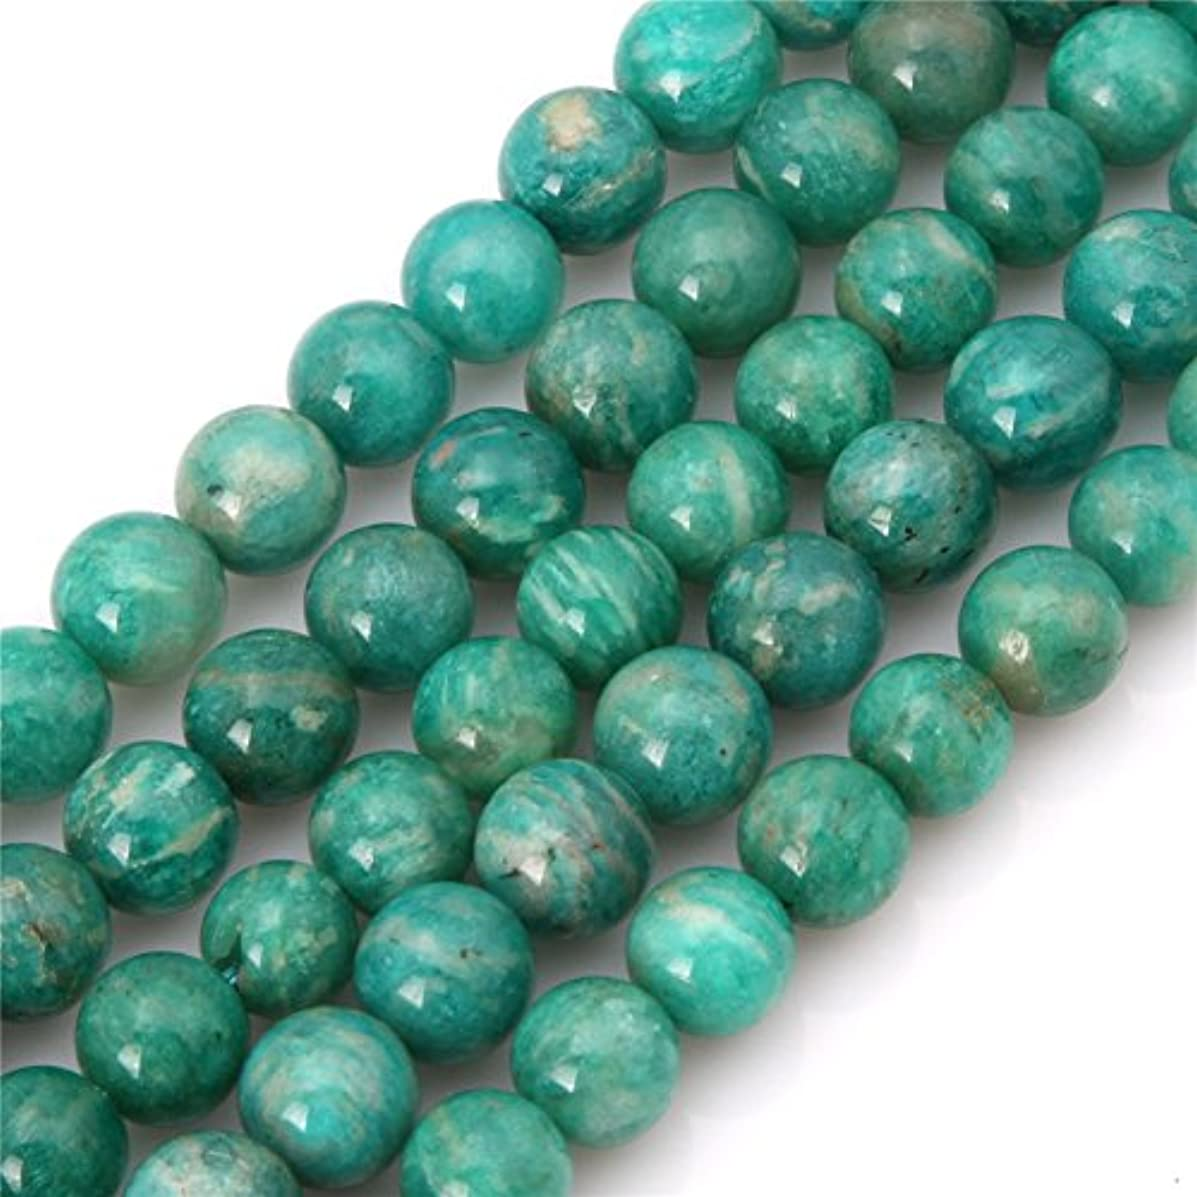 Natural Green Amazonite Stone Beads for Jewelry Making 15'' (8mm/Round)